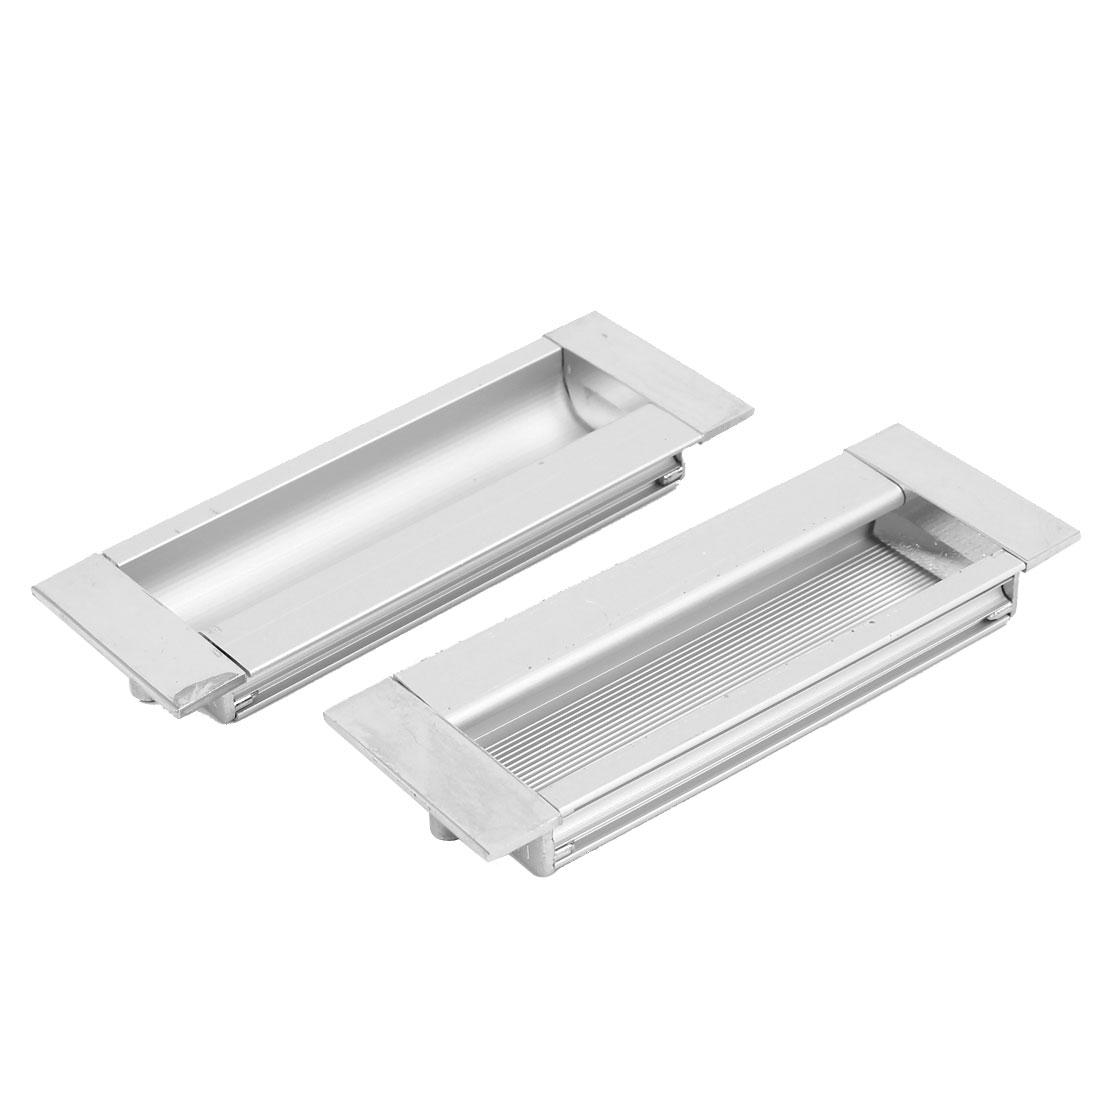 Drawer Cabinet Cupboard Sliding Door Rectangular Flush Pull Handle 110mm x 39mm 2 Pcs